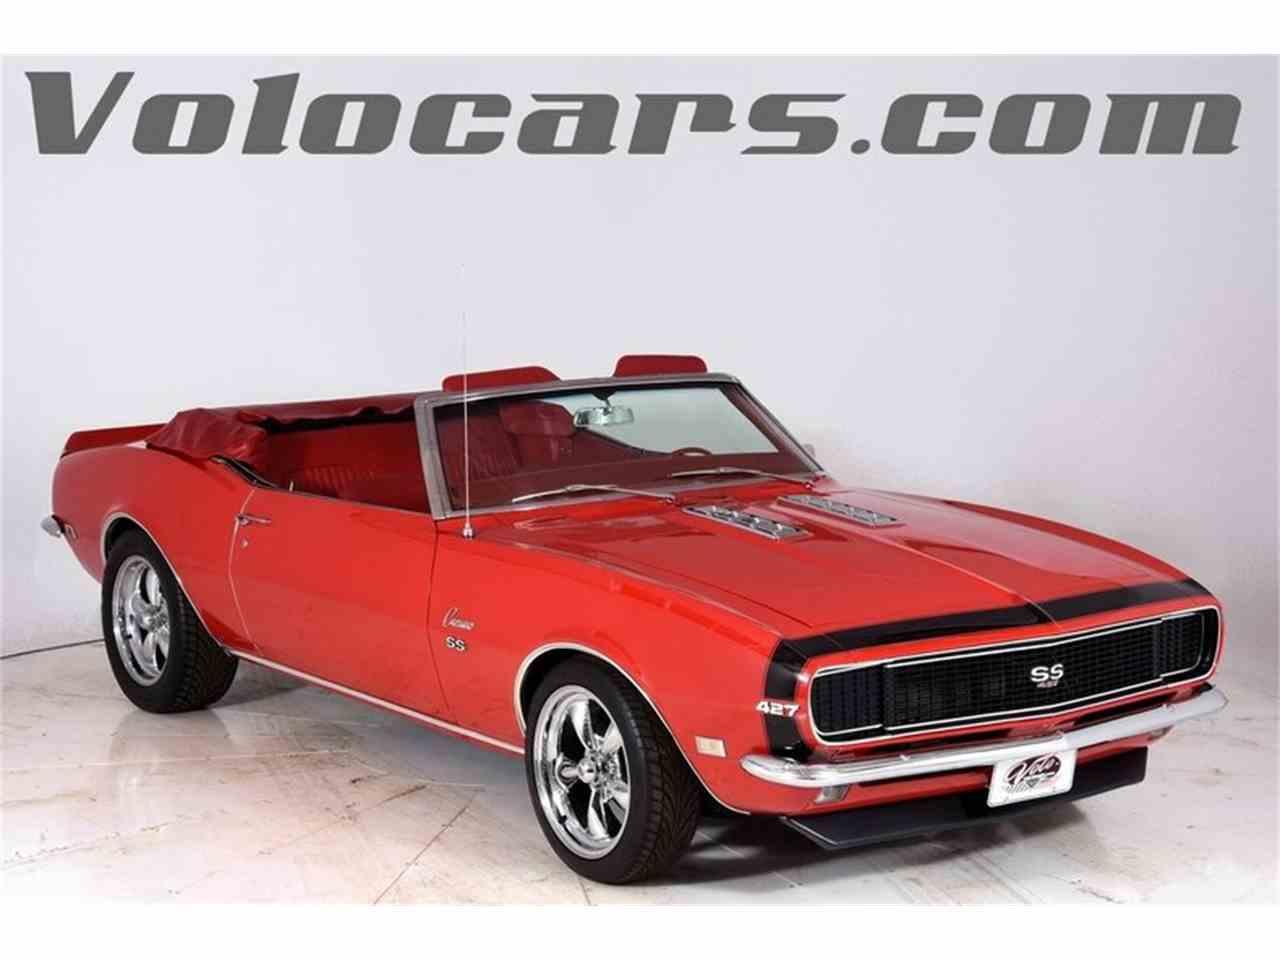 Find Chevrolet Camaro 1968 69 V8 302 Z28 Radiator Radiators Shop Rs Cc1044408 Cc1085407 Cc1082971 Cc1088547 Cc1086088 V17761